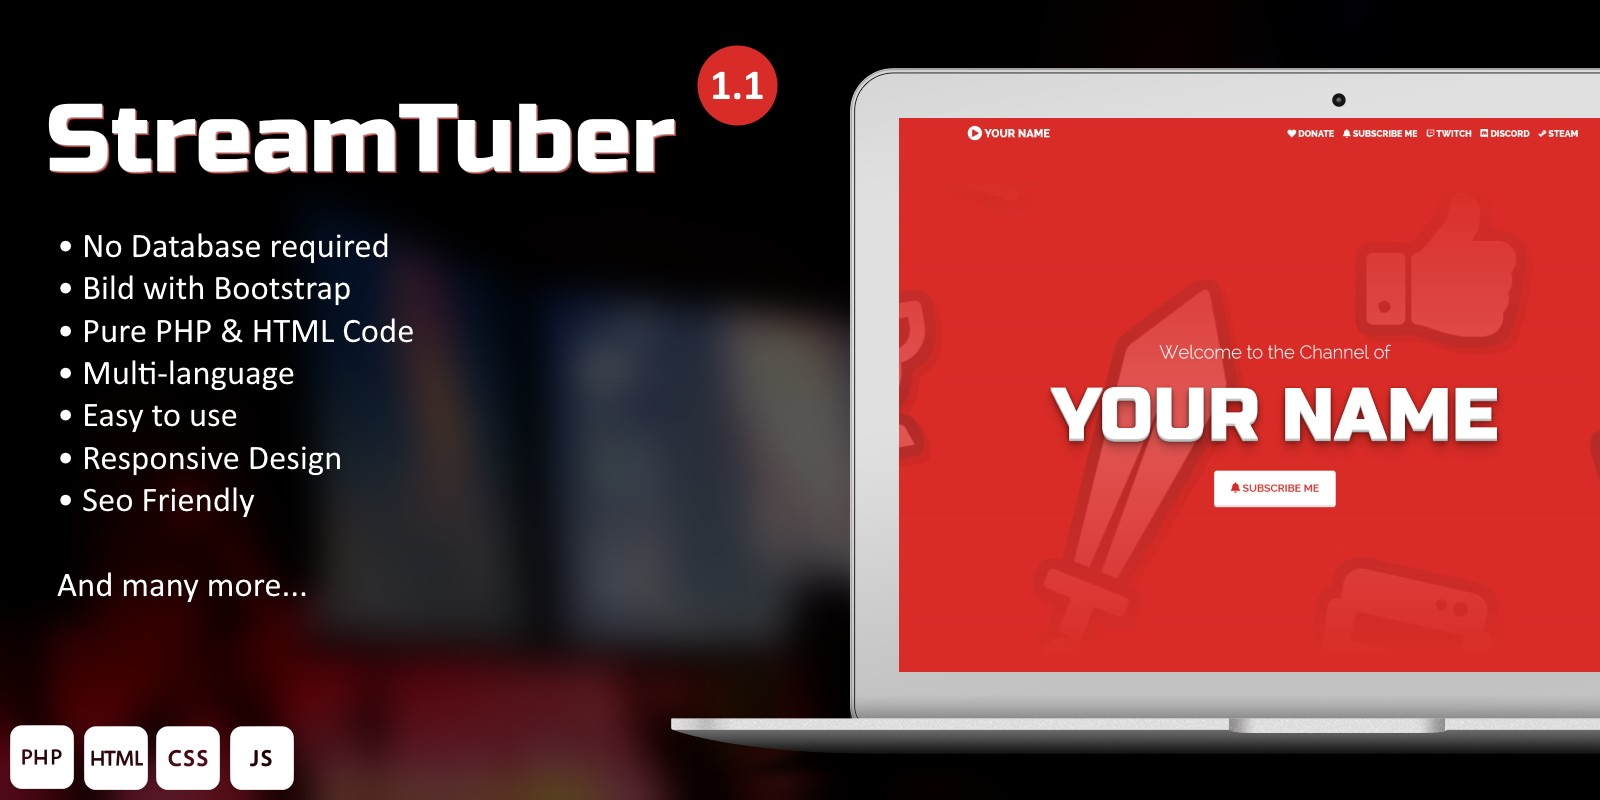 StreamTuber - YouTuber and Streamer Website CMS